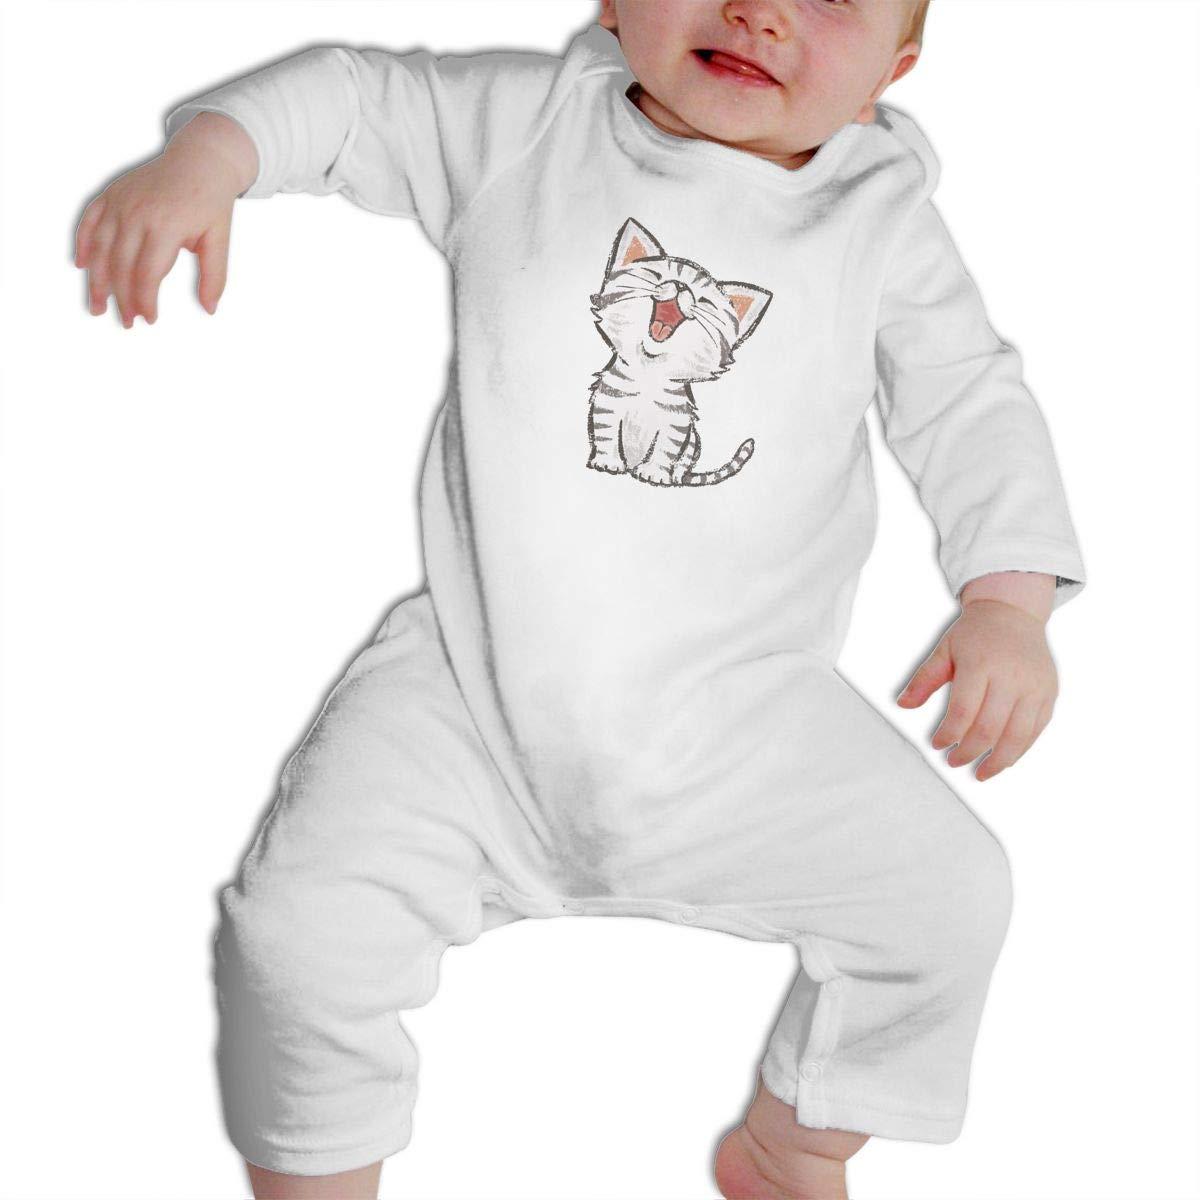 Cami American-shorthair-happy-cat Baby Boys Girls Long Sleeve Onesies Infant Bodysuit Baby For 6-24months